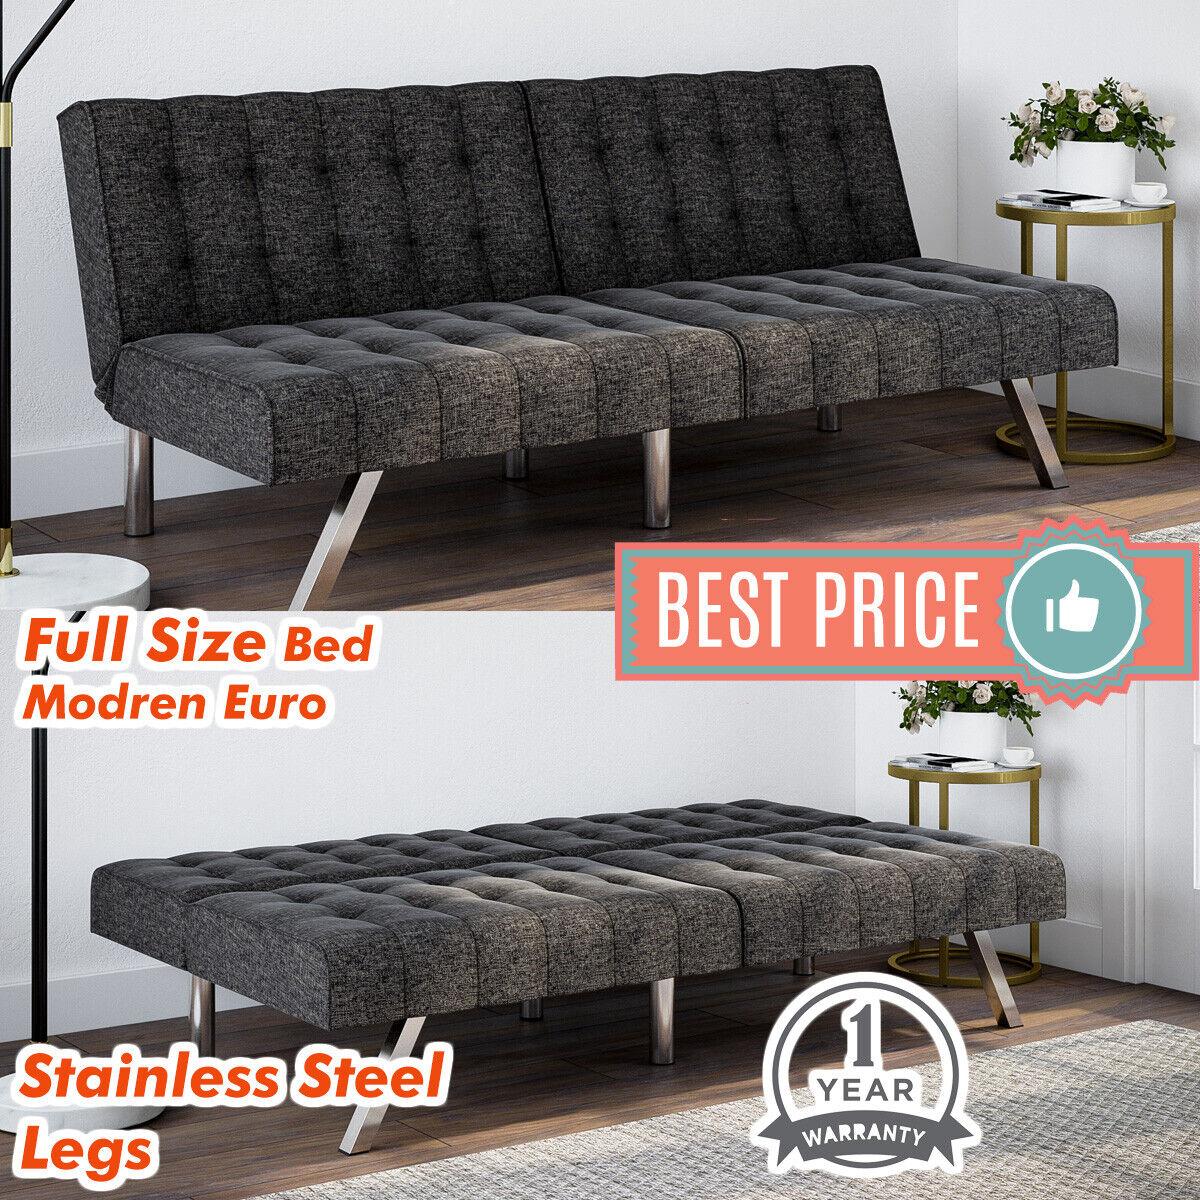 Tufted Convertible Futon Sofa Bed Full